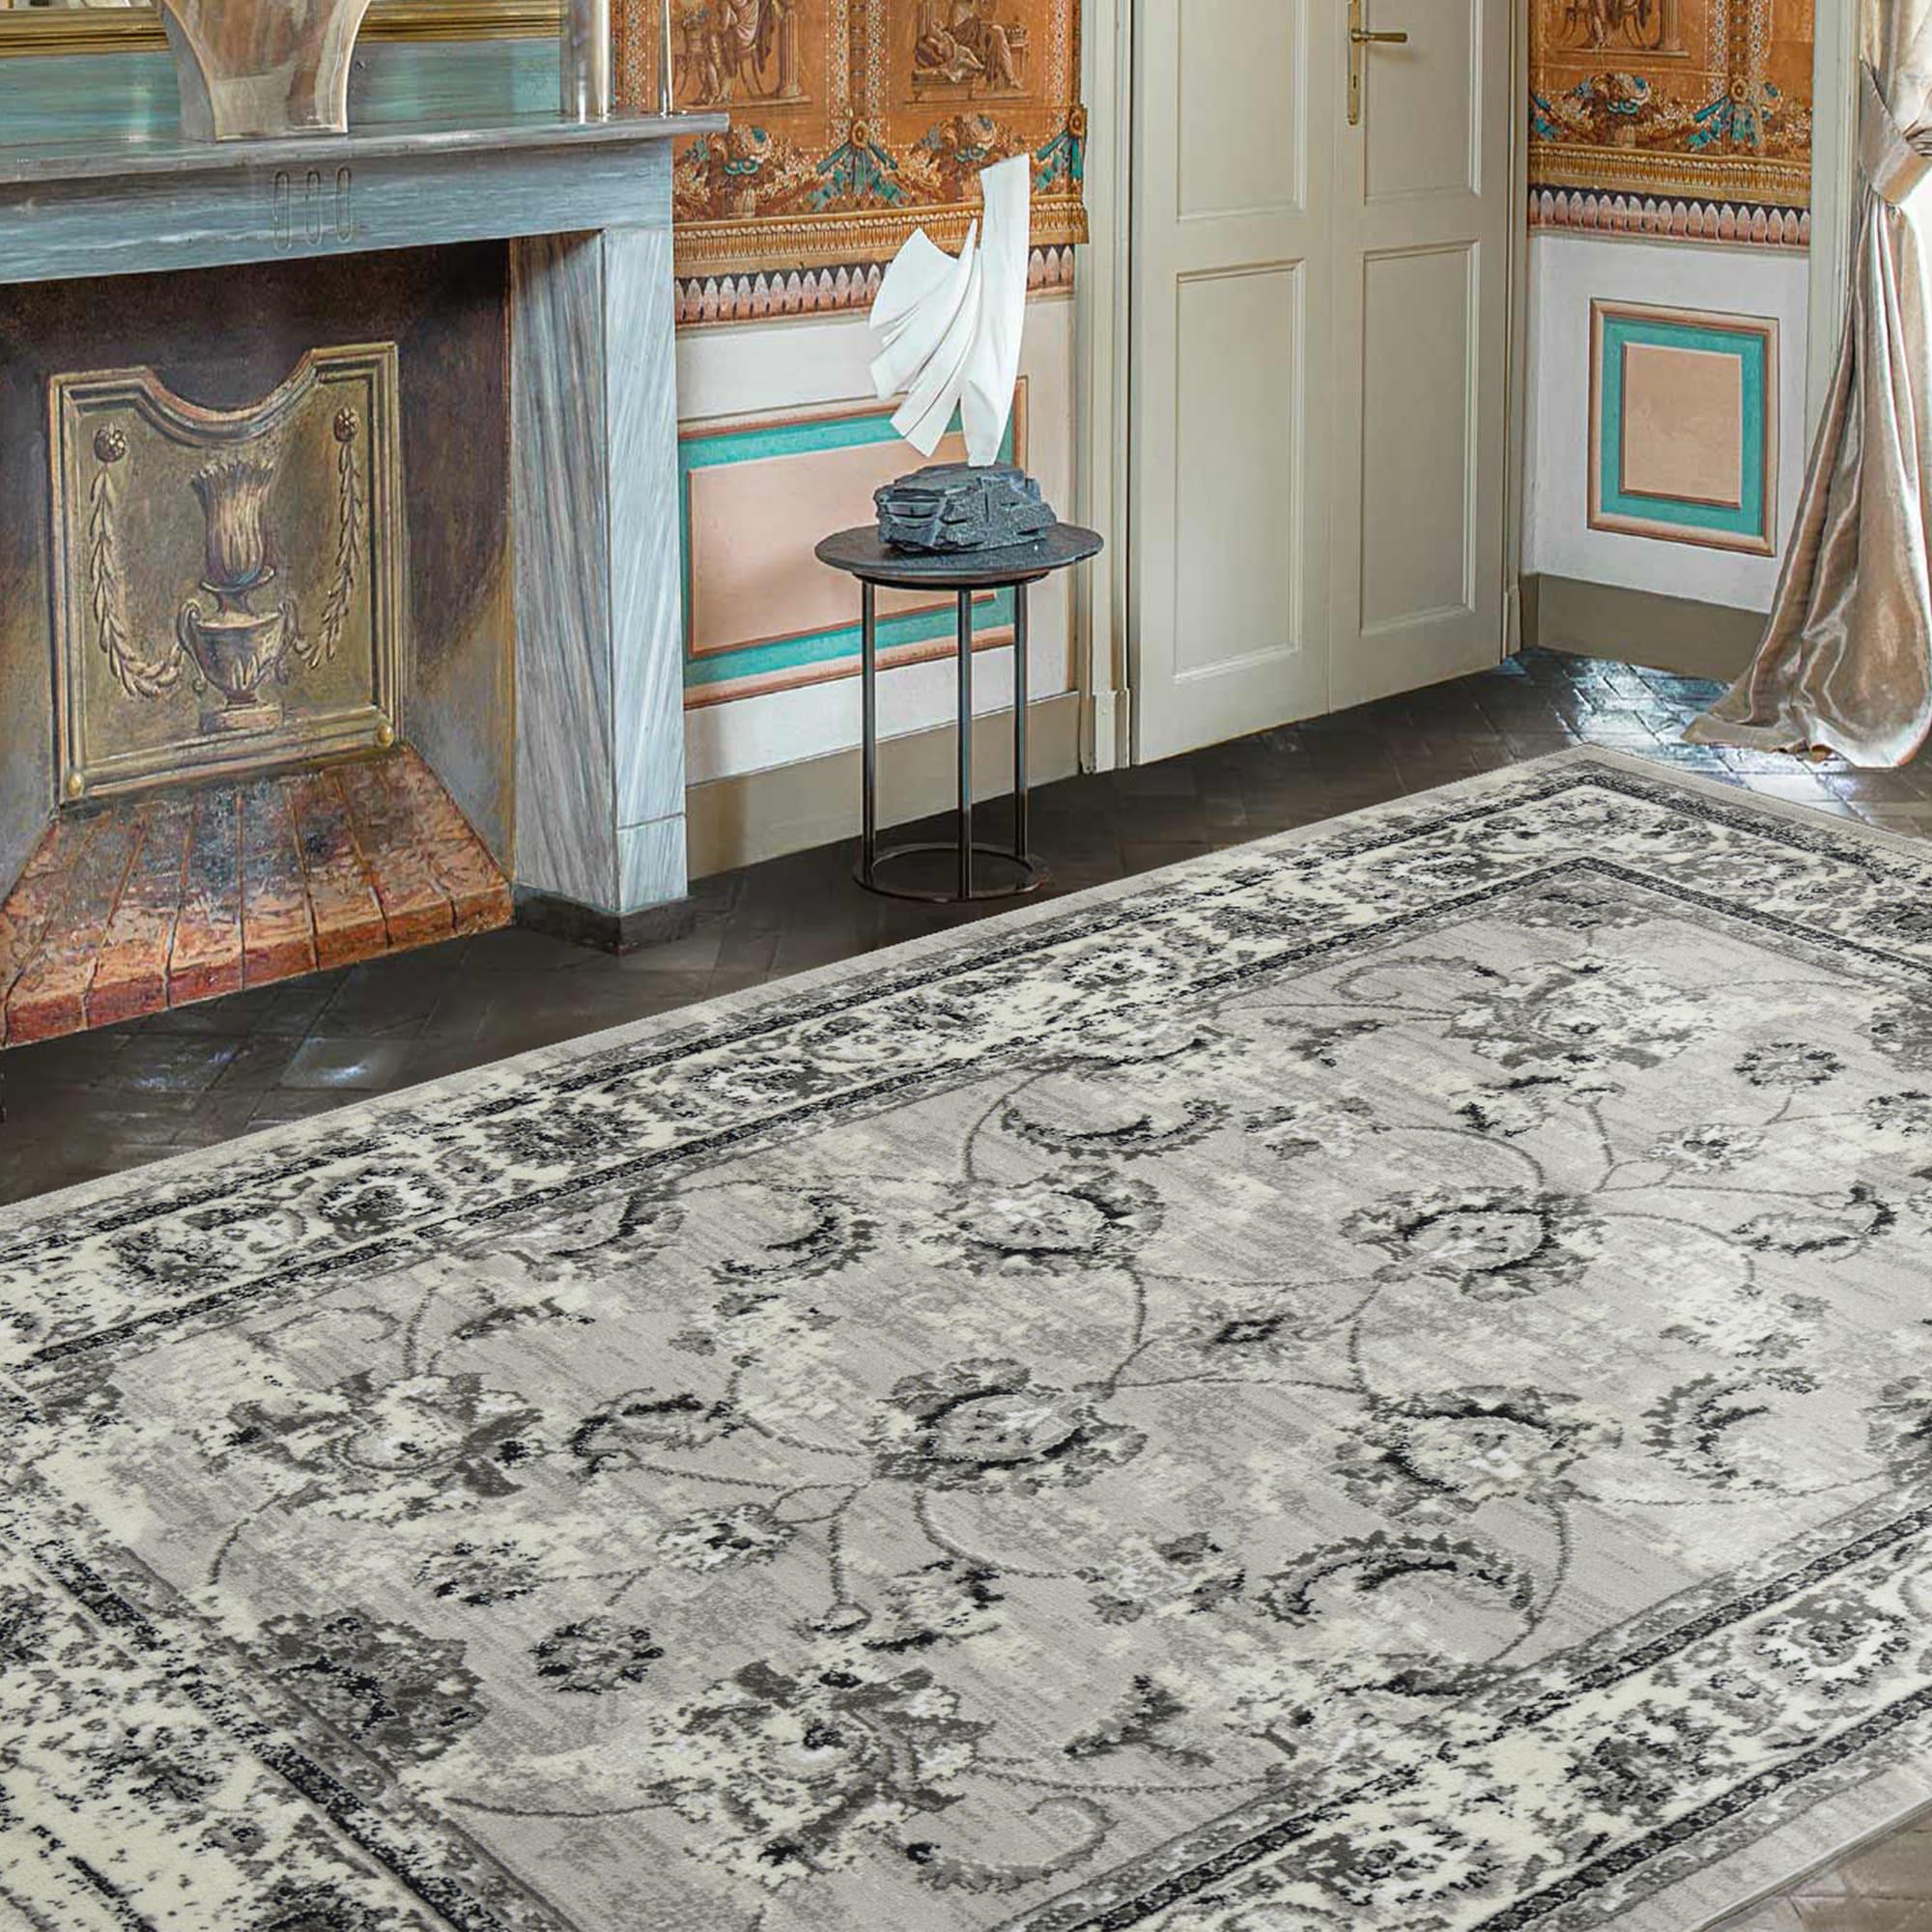 Ottomanson Royal Collection Distressed Floral Design Area Rug (5 X 7) - 53 x 7 (Dark Grey)